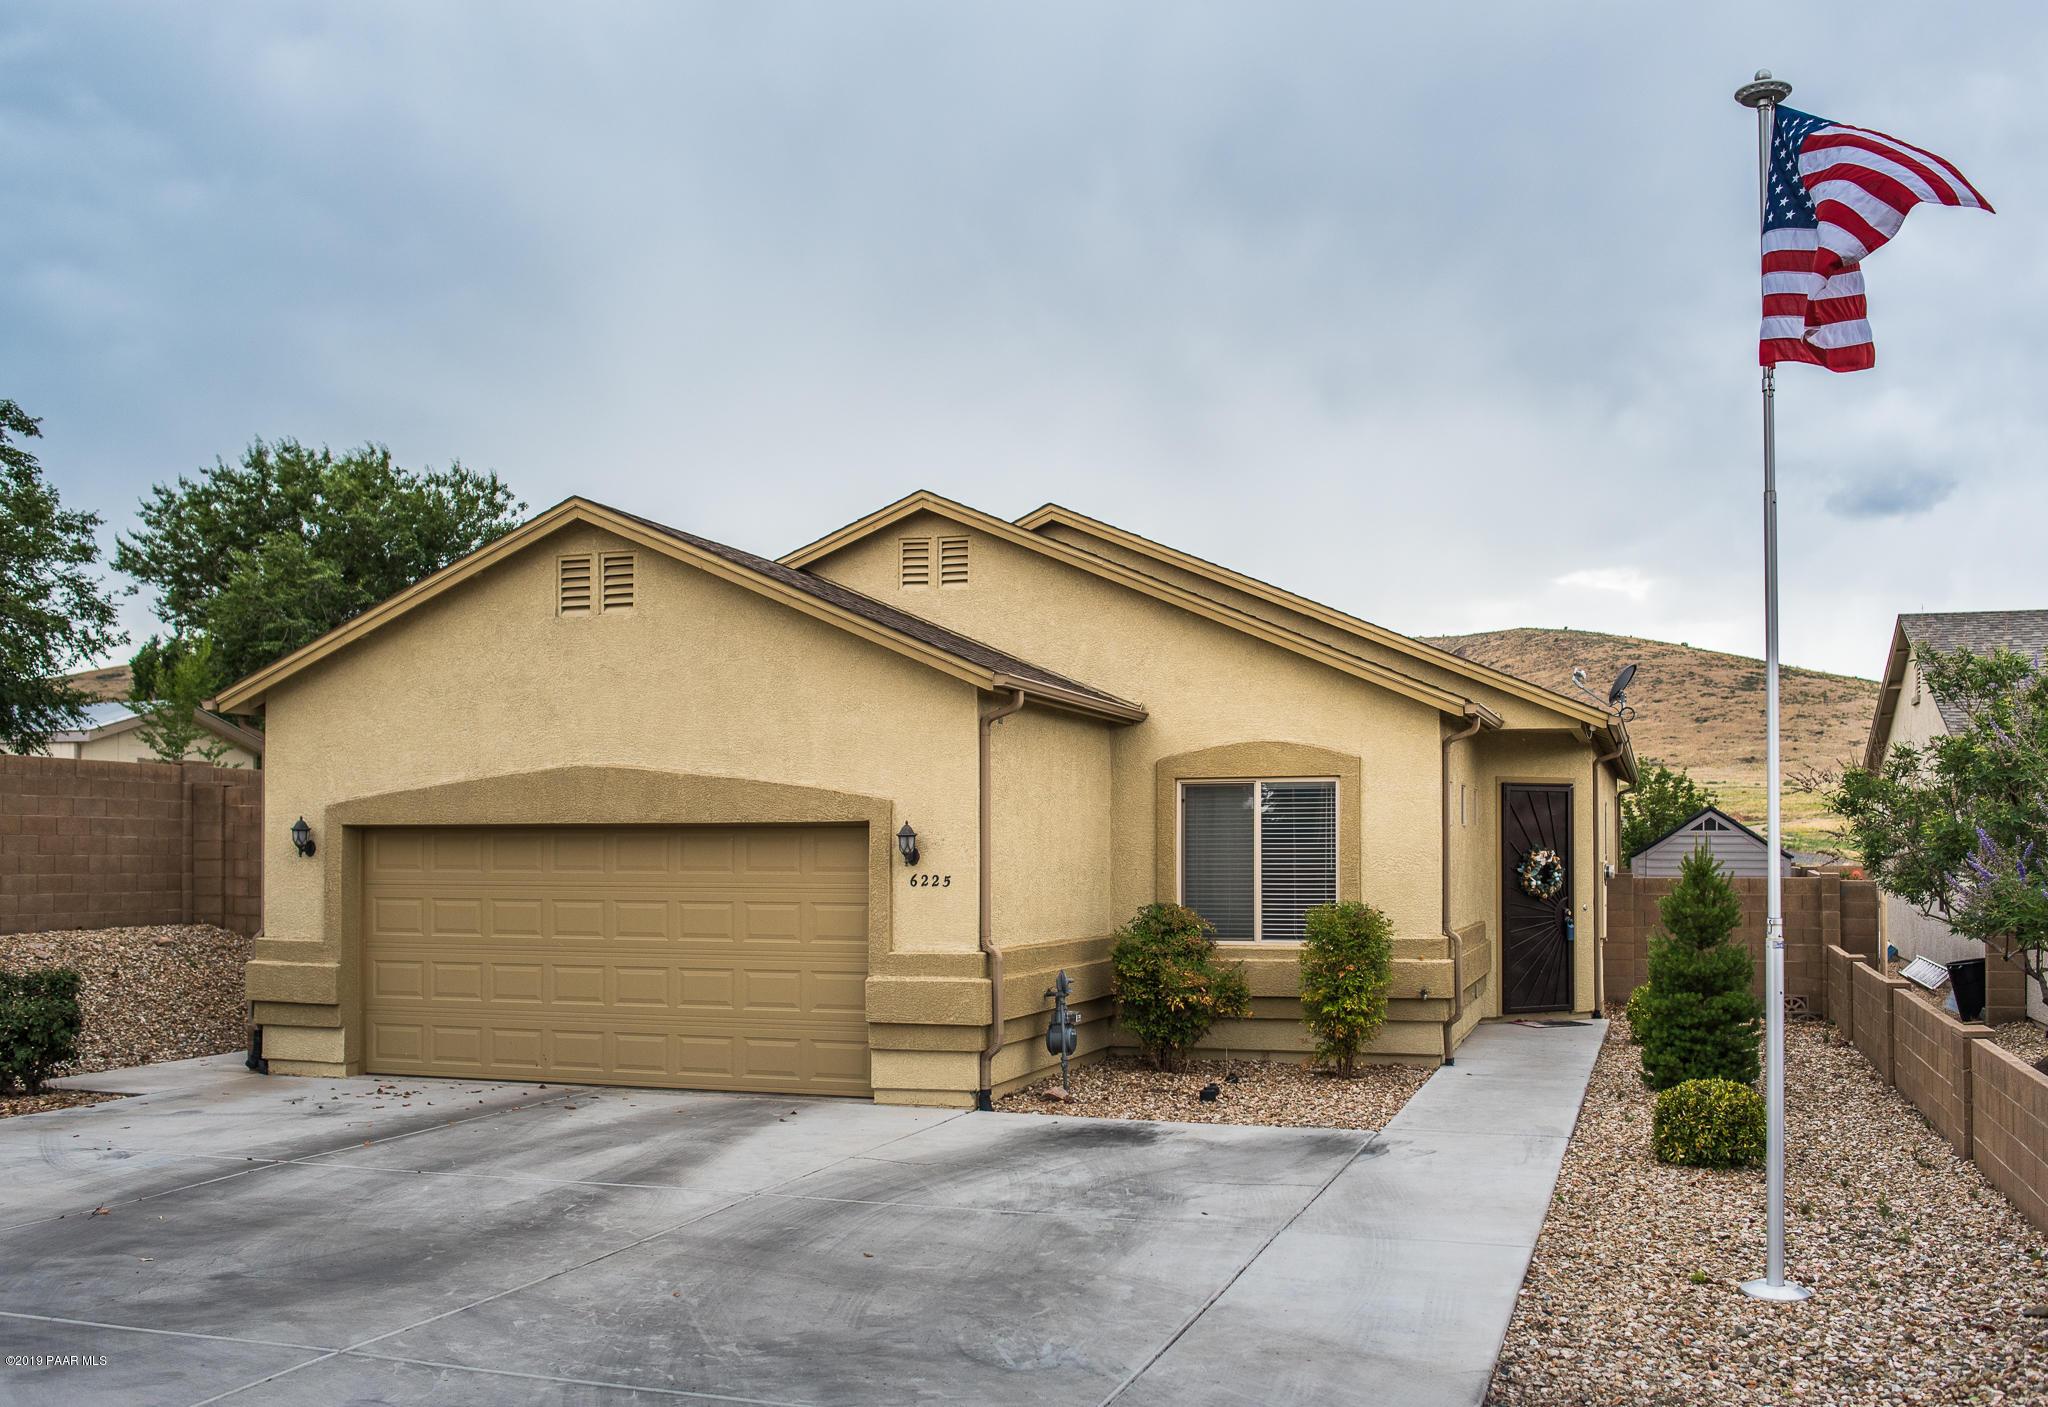 Photo of 6225 Boothwyn, Prescott Valley, AZ 86314